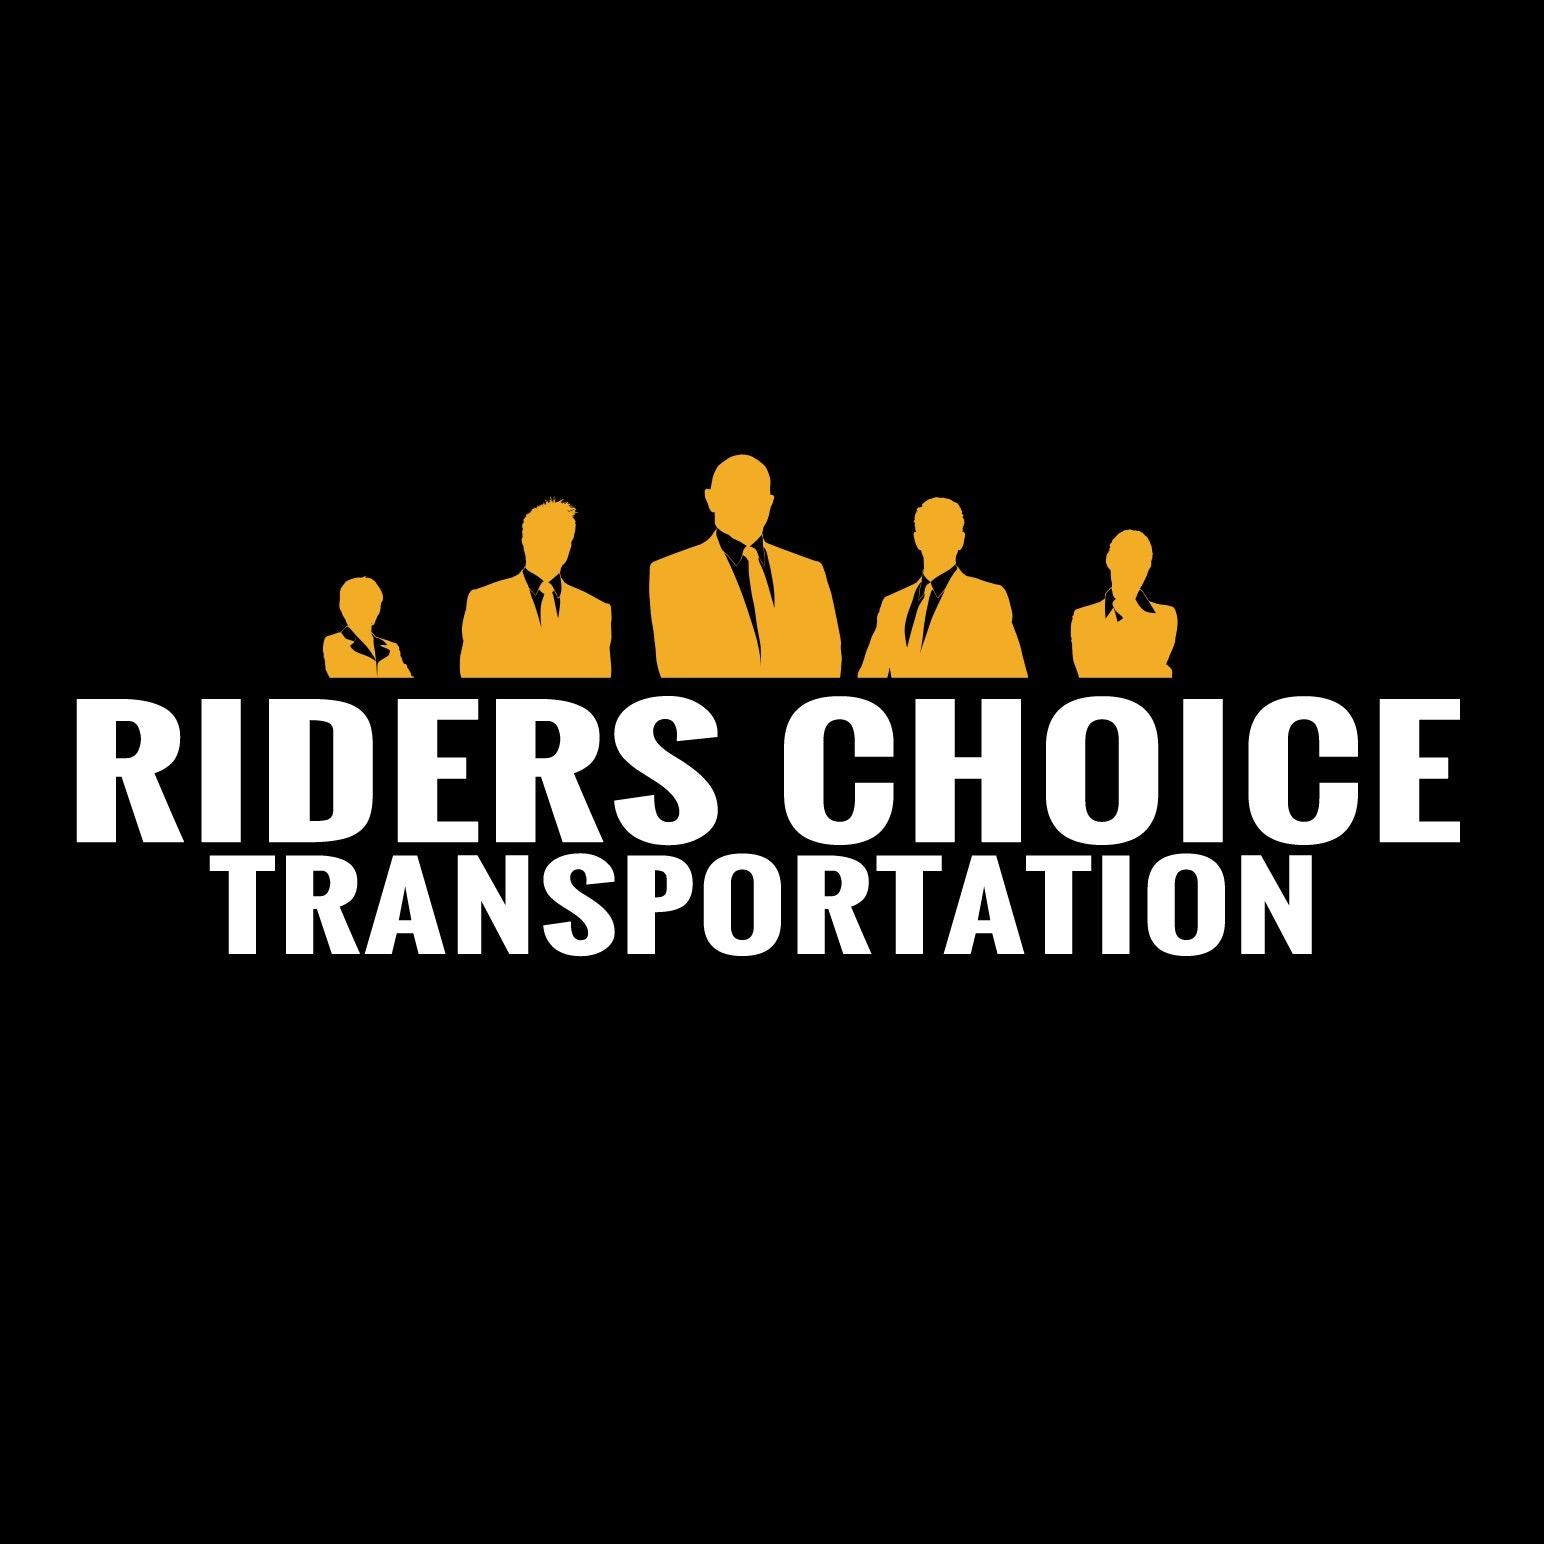 Riders Choice Transportation